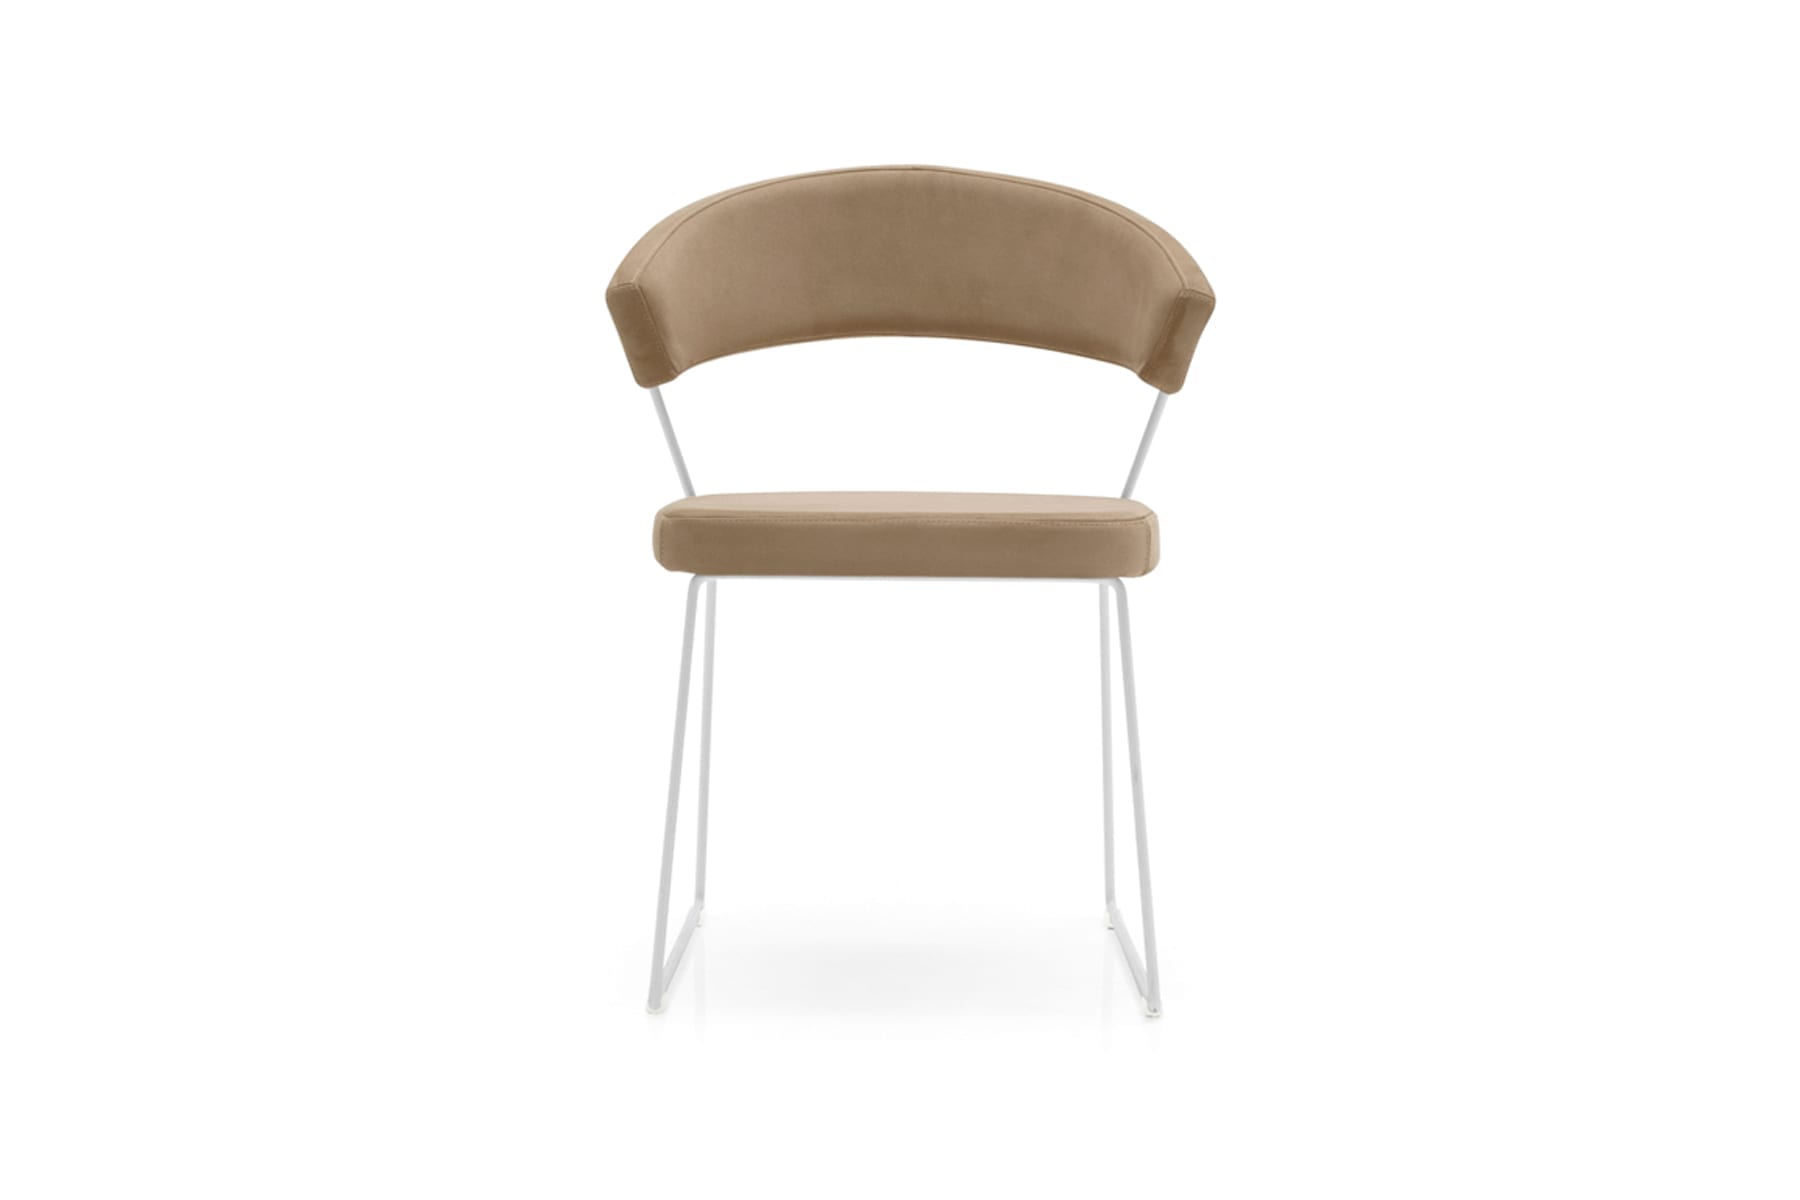 calligaris new york dining chair mckenzie willis. Black Bedroom Furniture Sets. Home Design Ideas